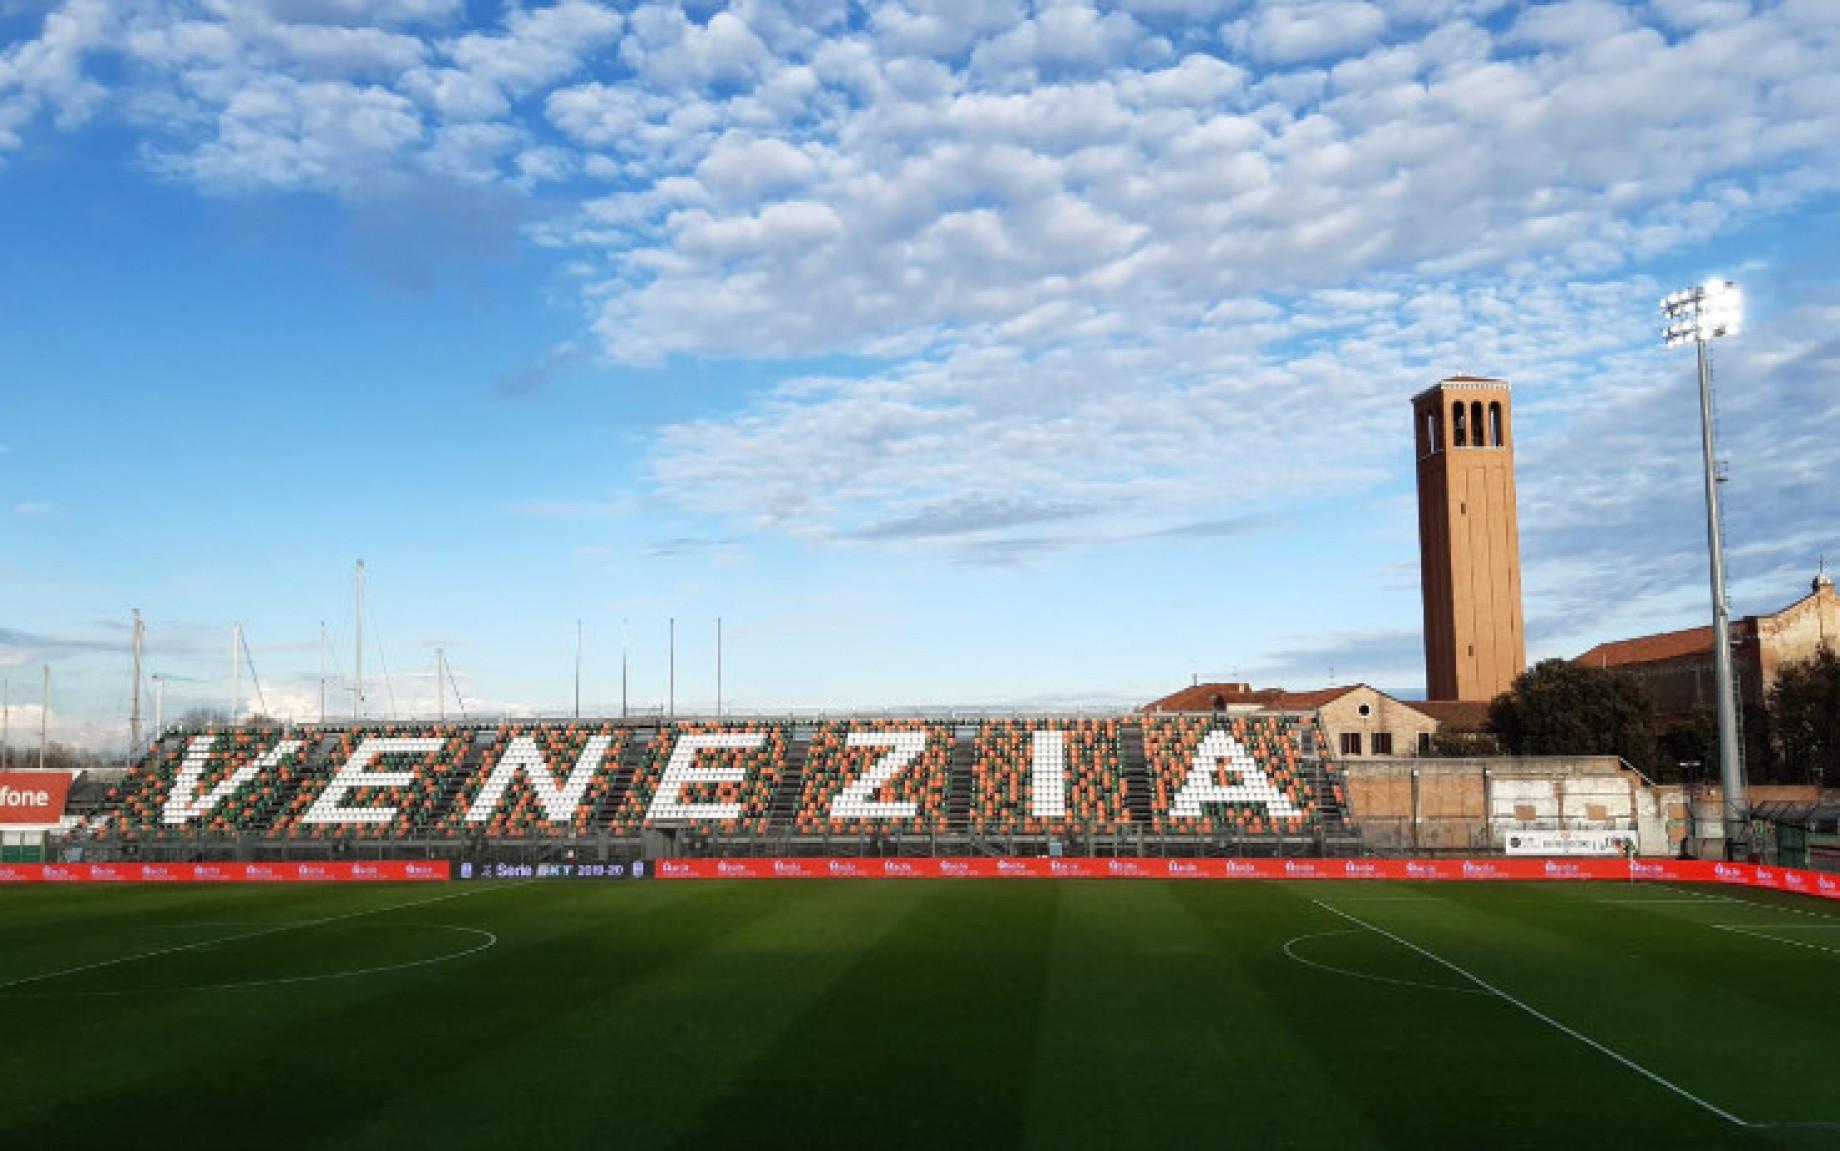 venezia_penzo_gdm.jpg